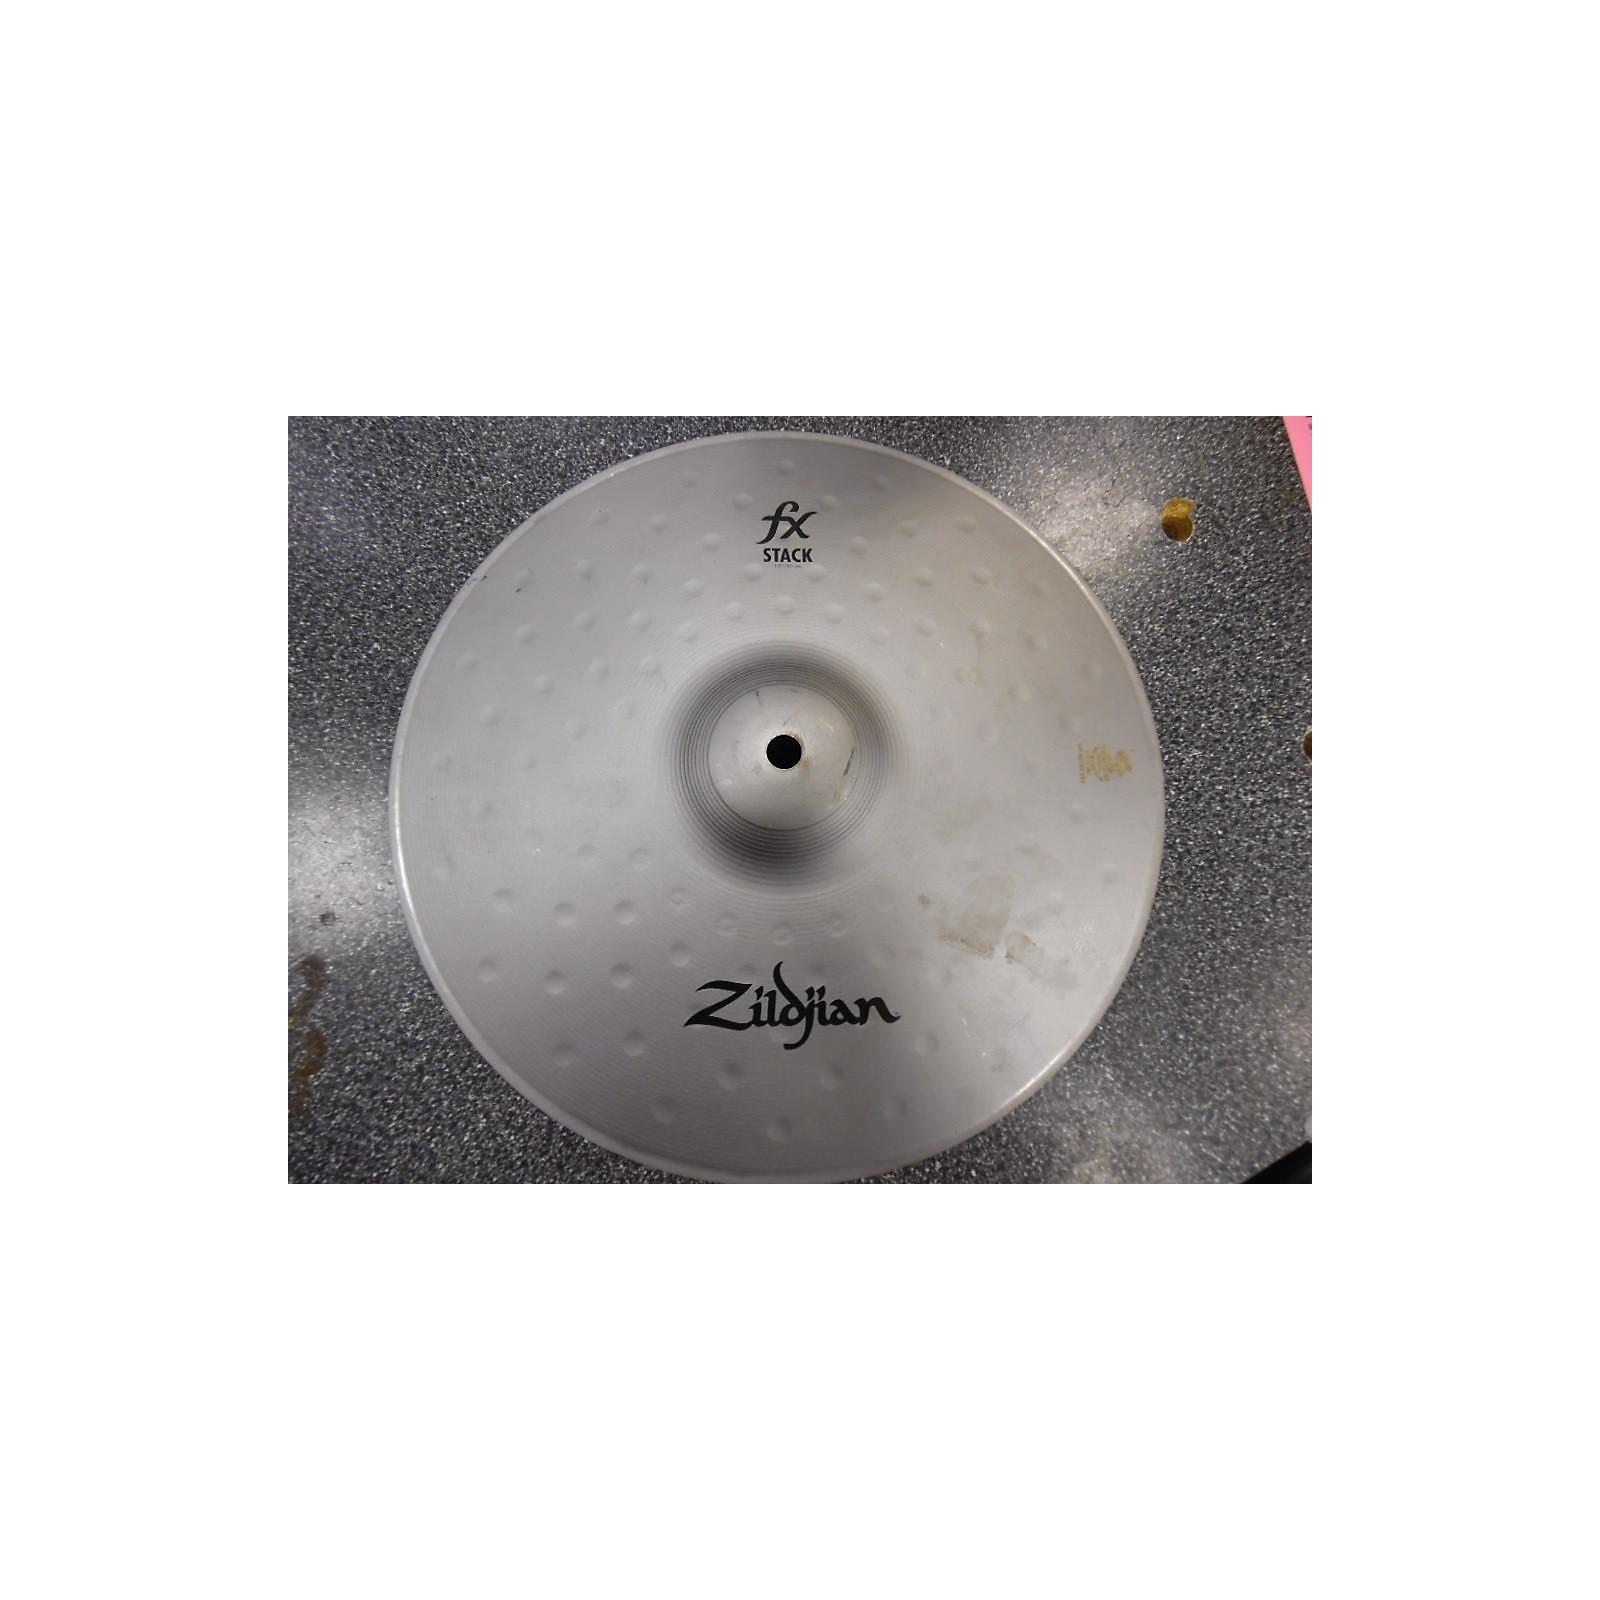 Zildjian 12in 12 ' Stacker Cymbal